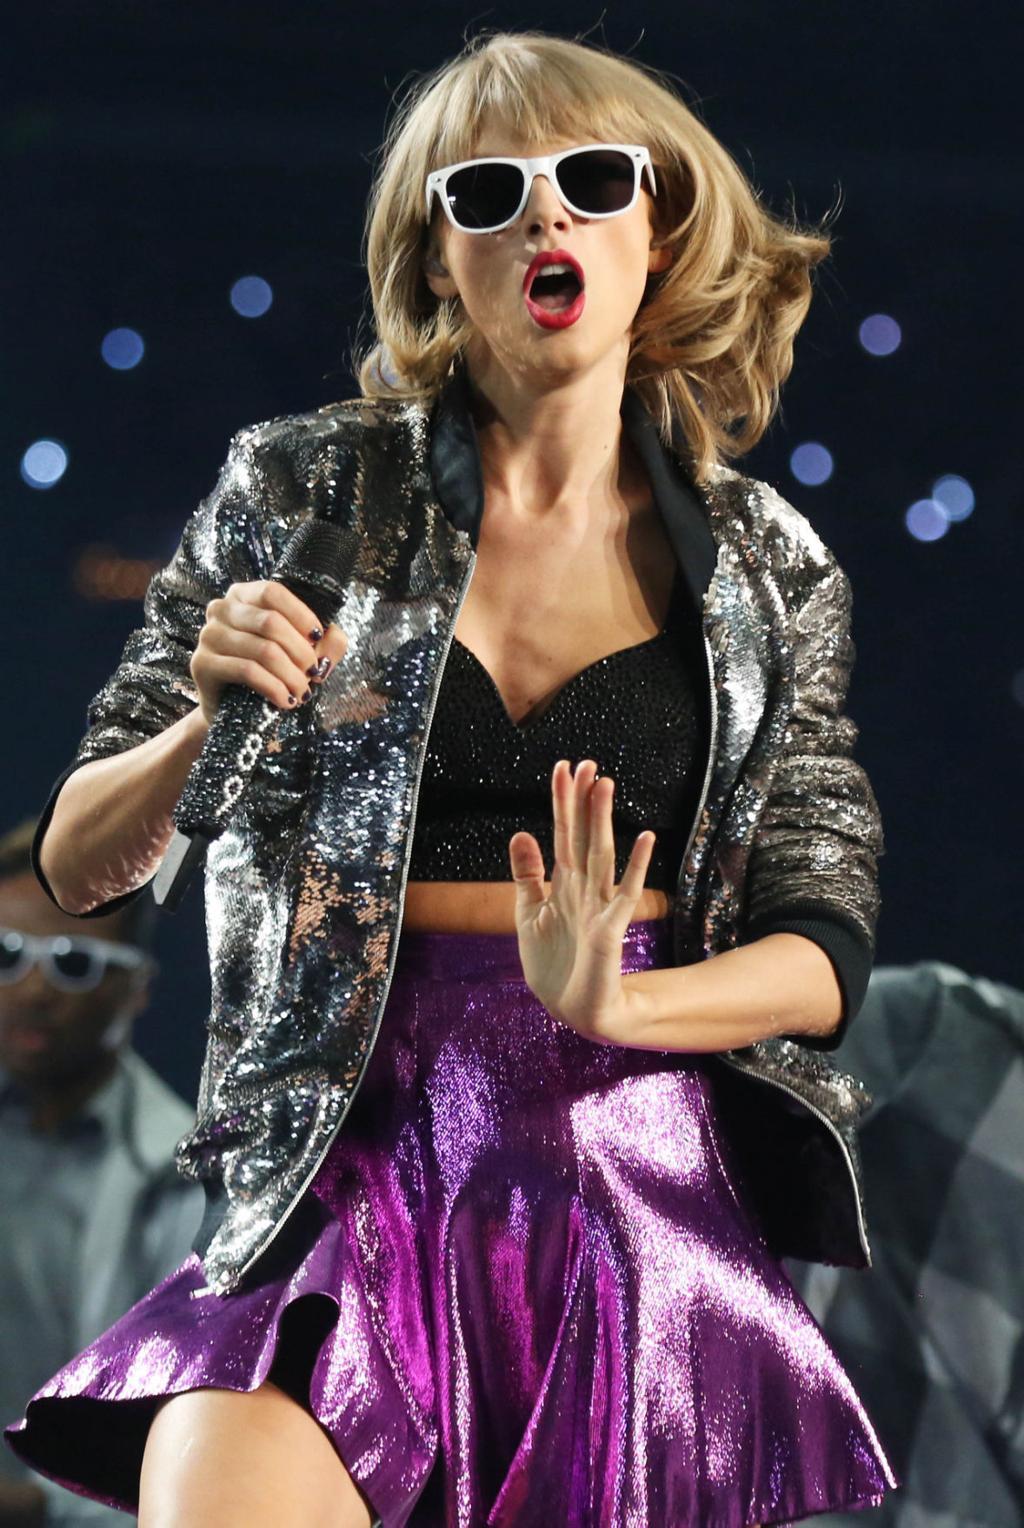 The world's biggest pop star returns to Omaha | Music